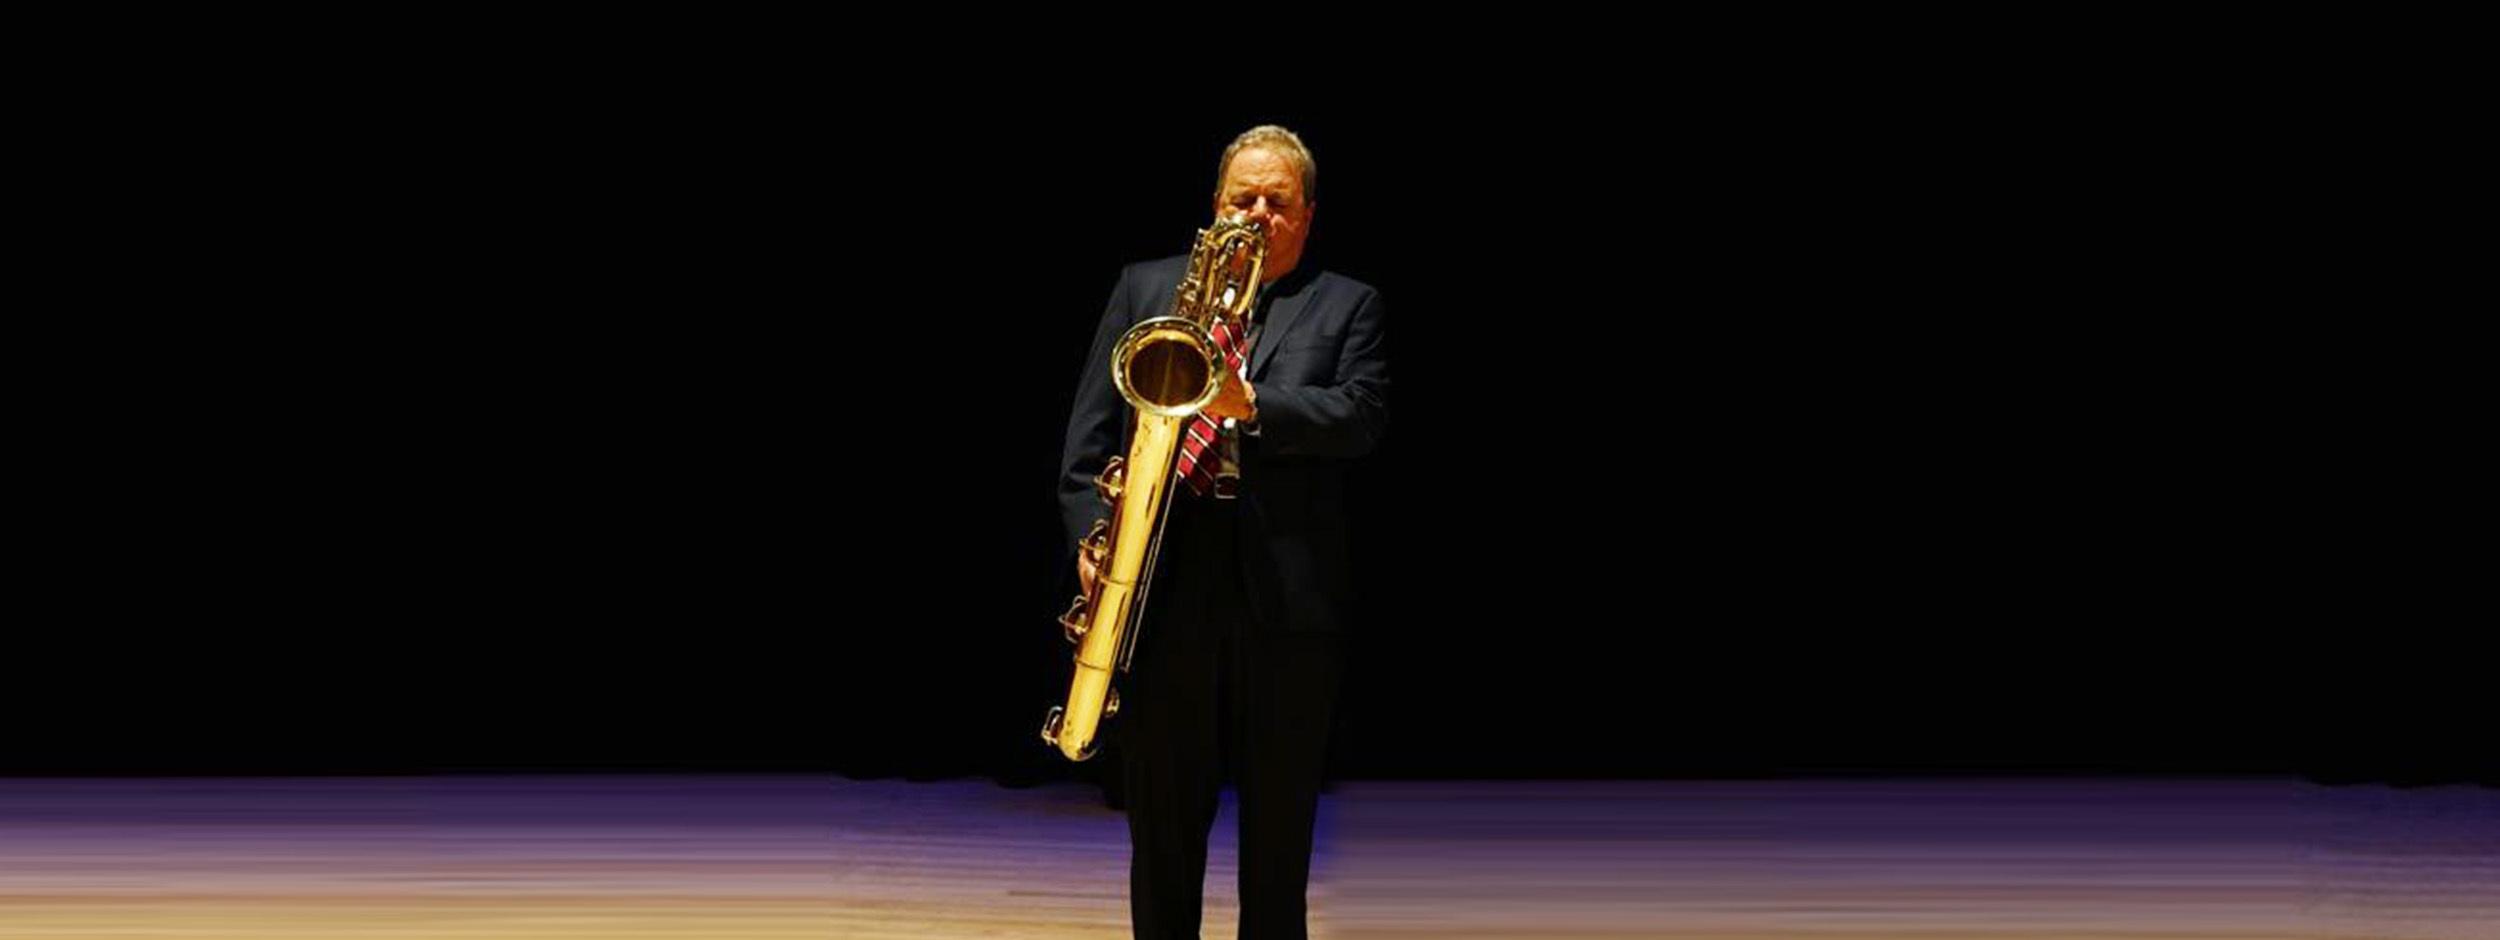 danny harrington s life and the influence of baritone saxophonist